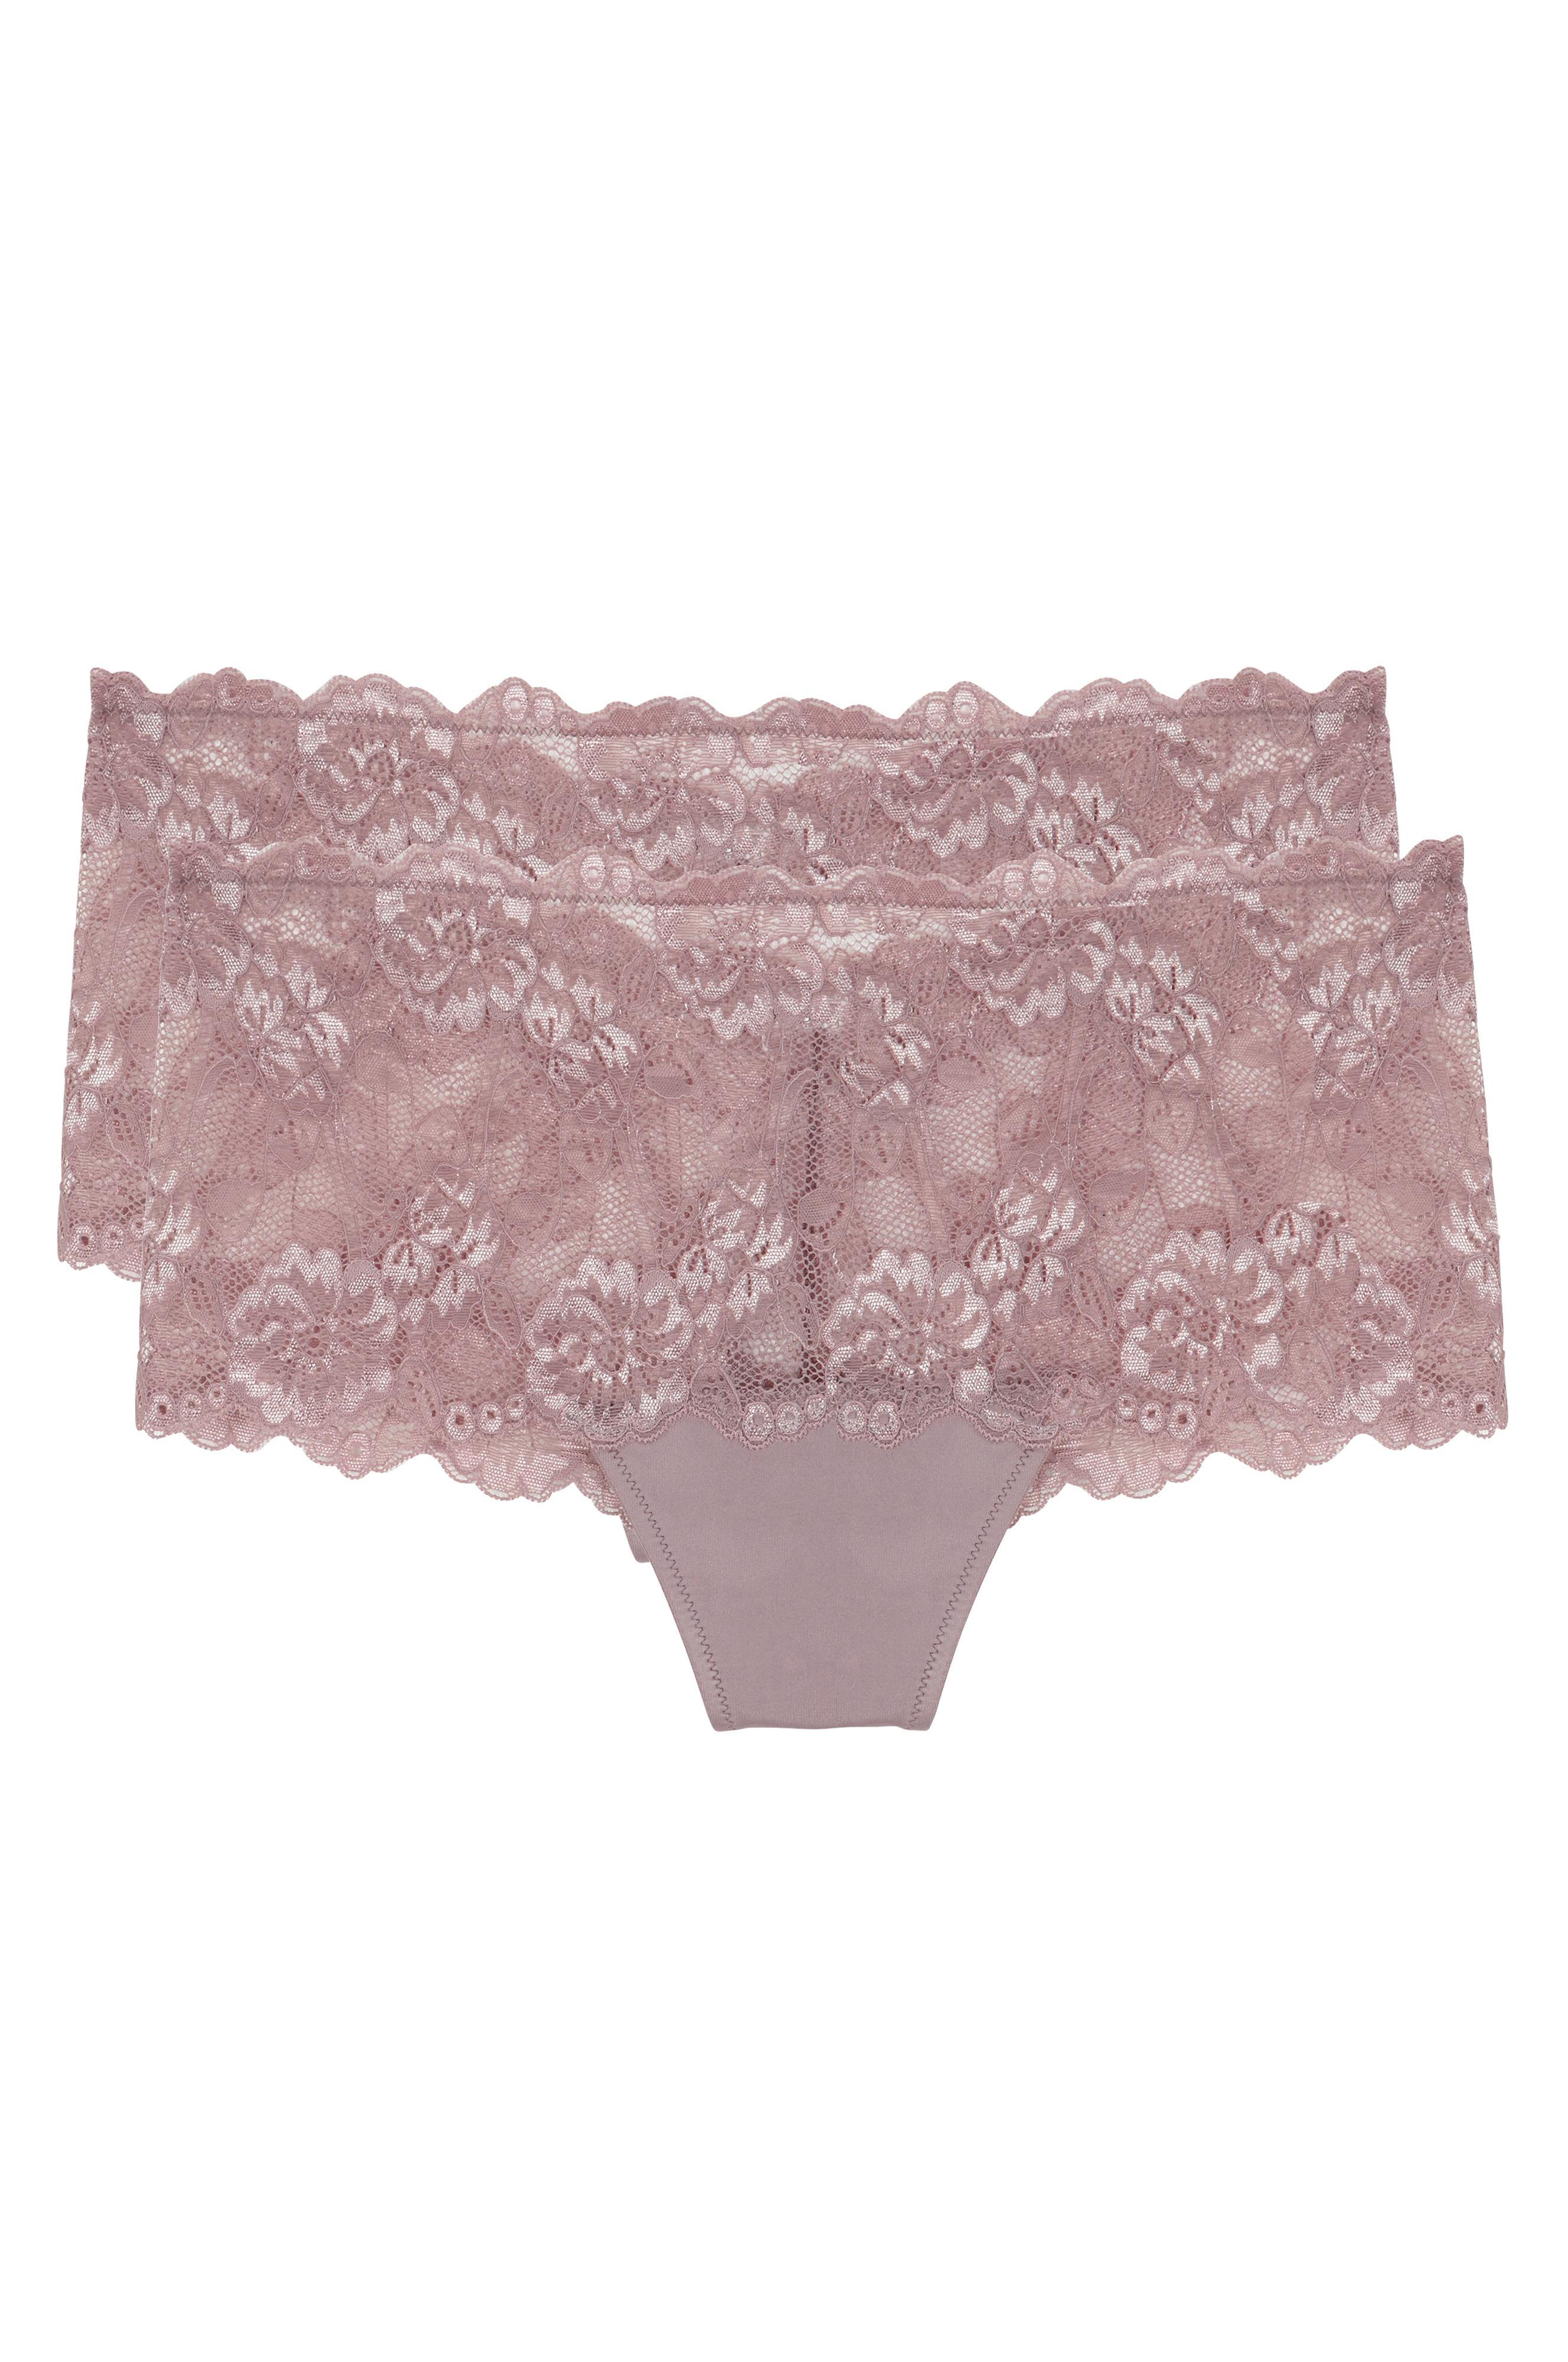 erotiska underkläder dam micro stringtrosor